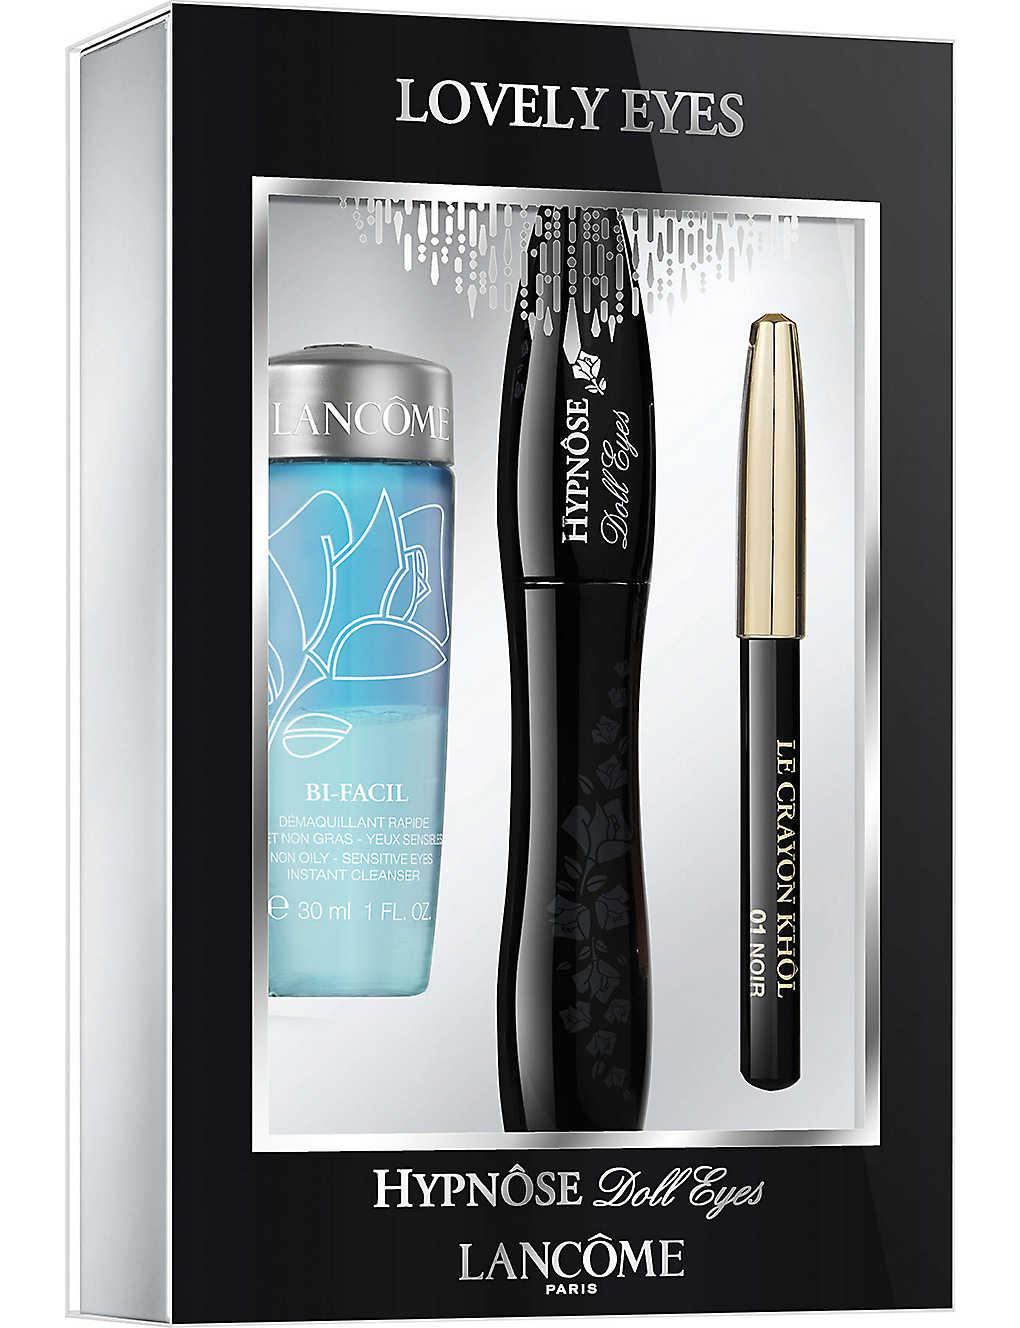 051674e5890 LANCOME - Hypnose Doll Eyes Mascara gift set   Selfridges.com